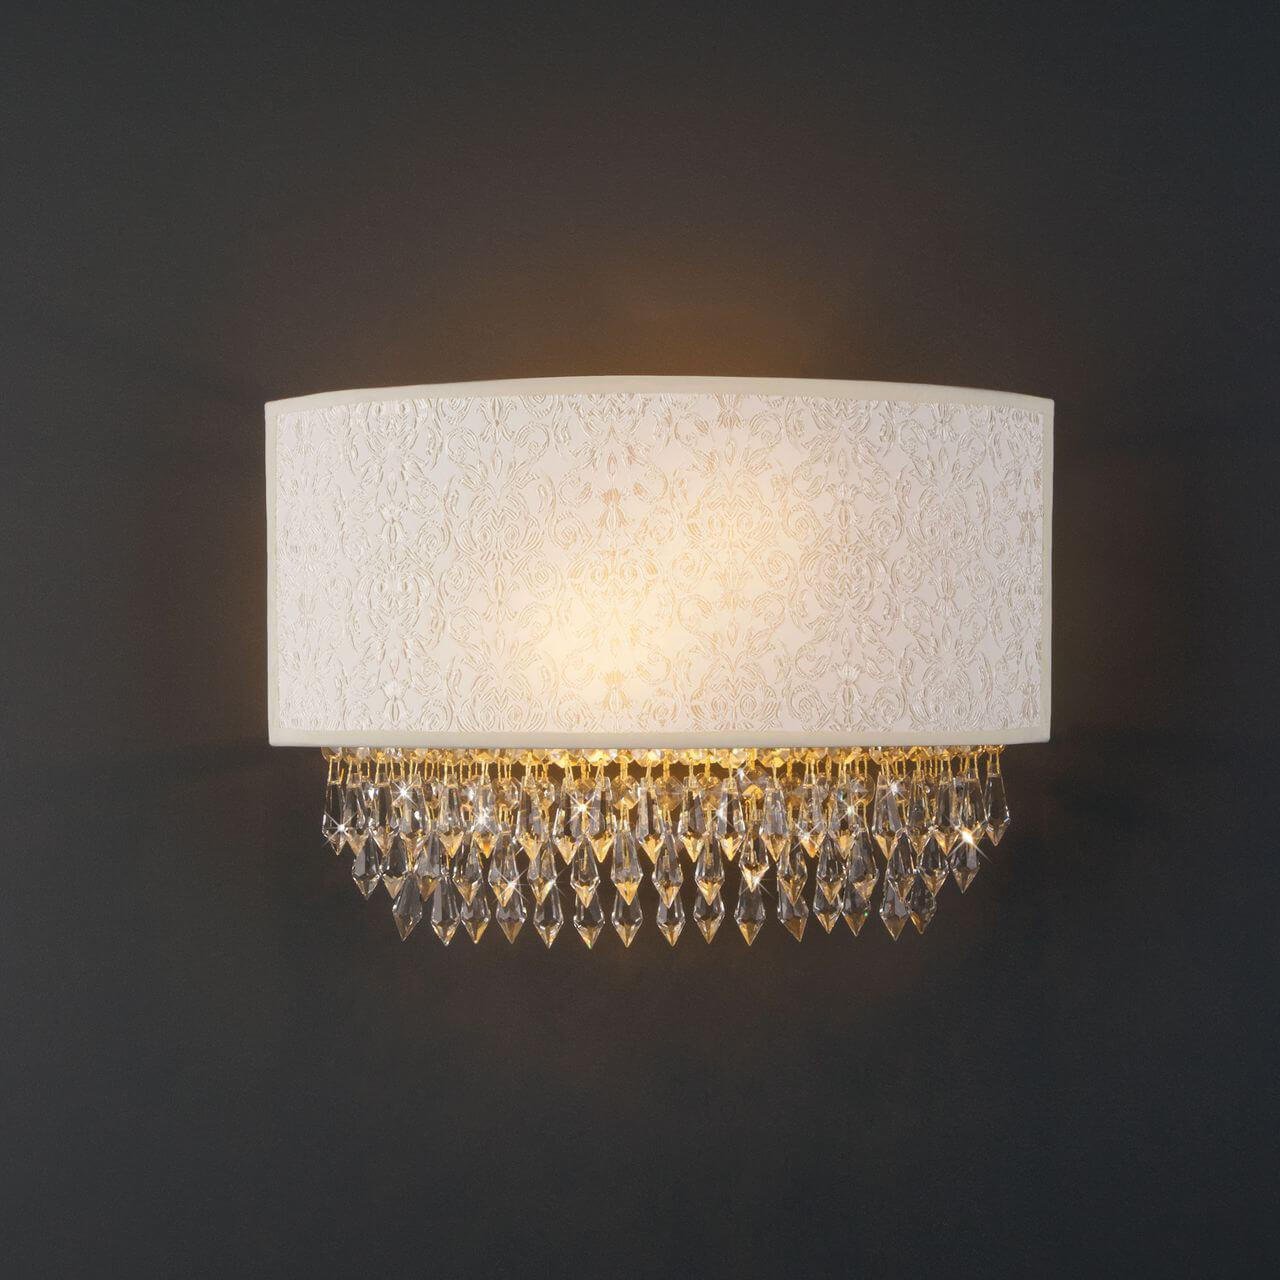 Настенный светильник Bogates 305/2 Strotskis, E14, 40 Вт цены